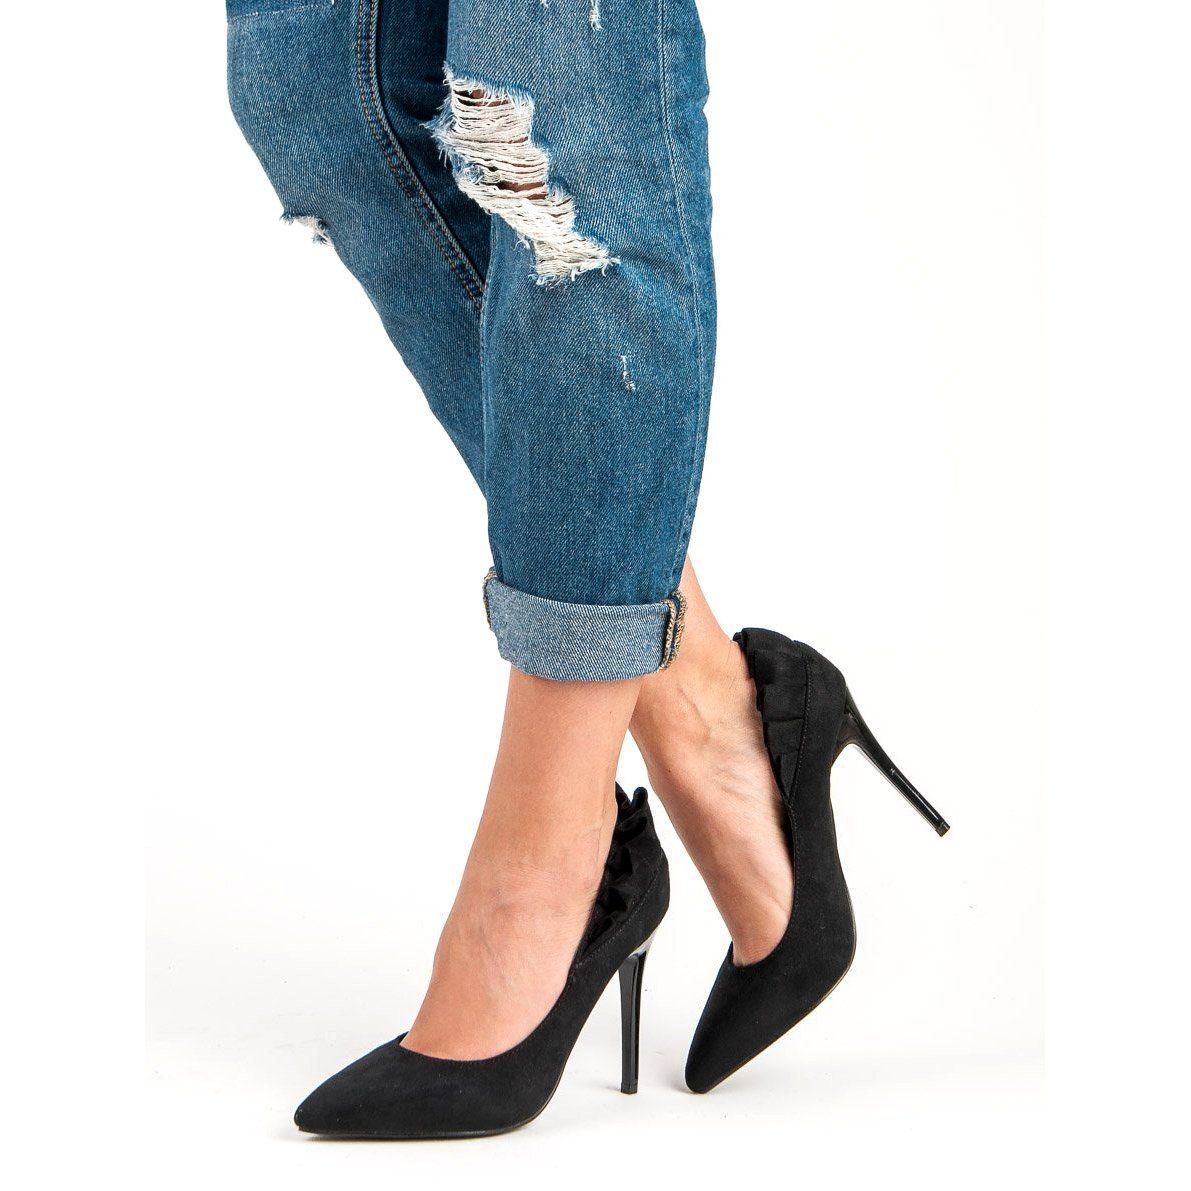 Eleganckie Czarne Szpilki Stiletto Heels Stiletto Fashion